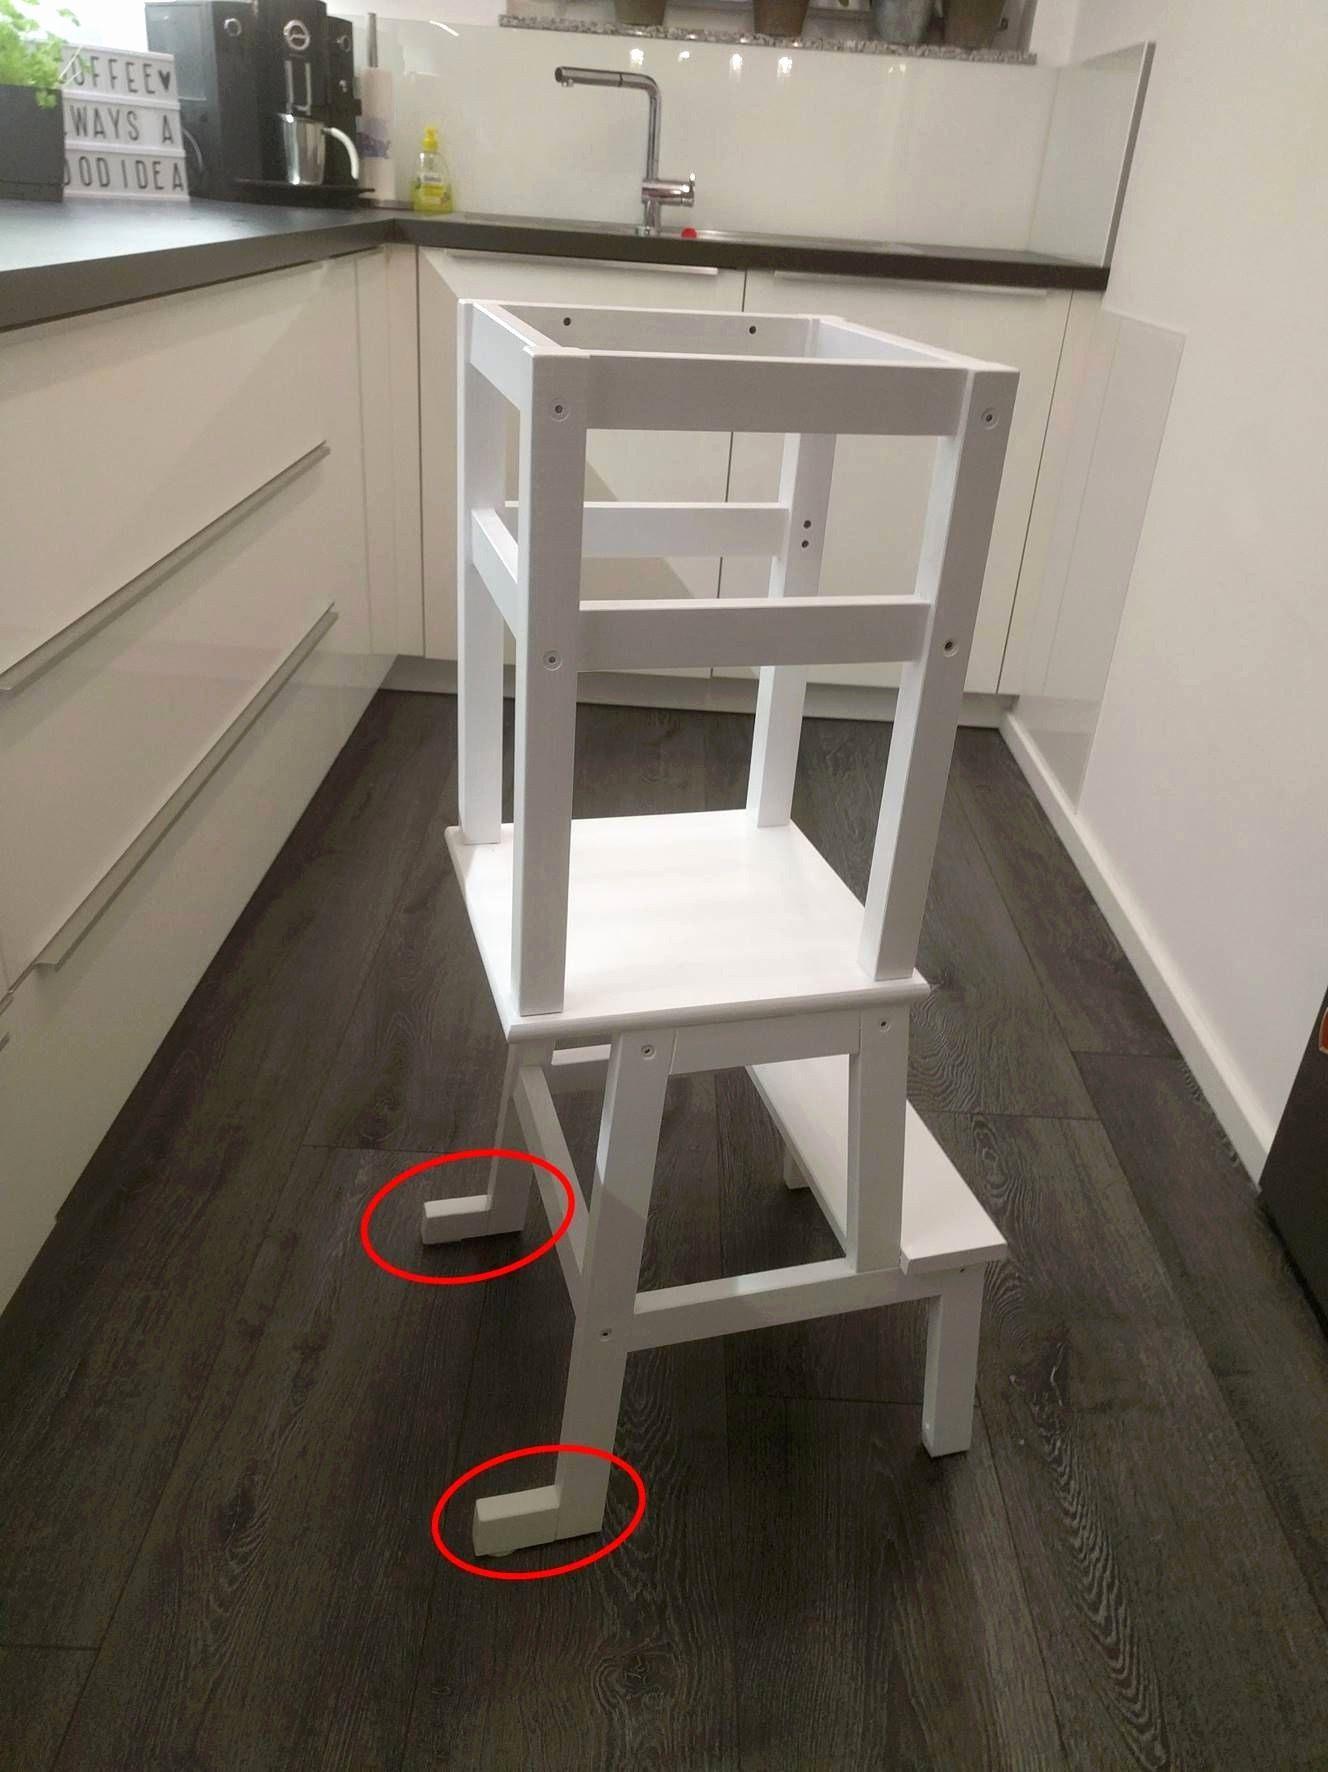 Lit Relevable Ikea Joli Lit Escamotable Armoire Unique Armoire Unique Ikea Lit Armoire